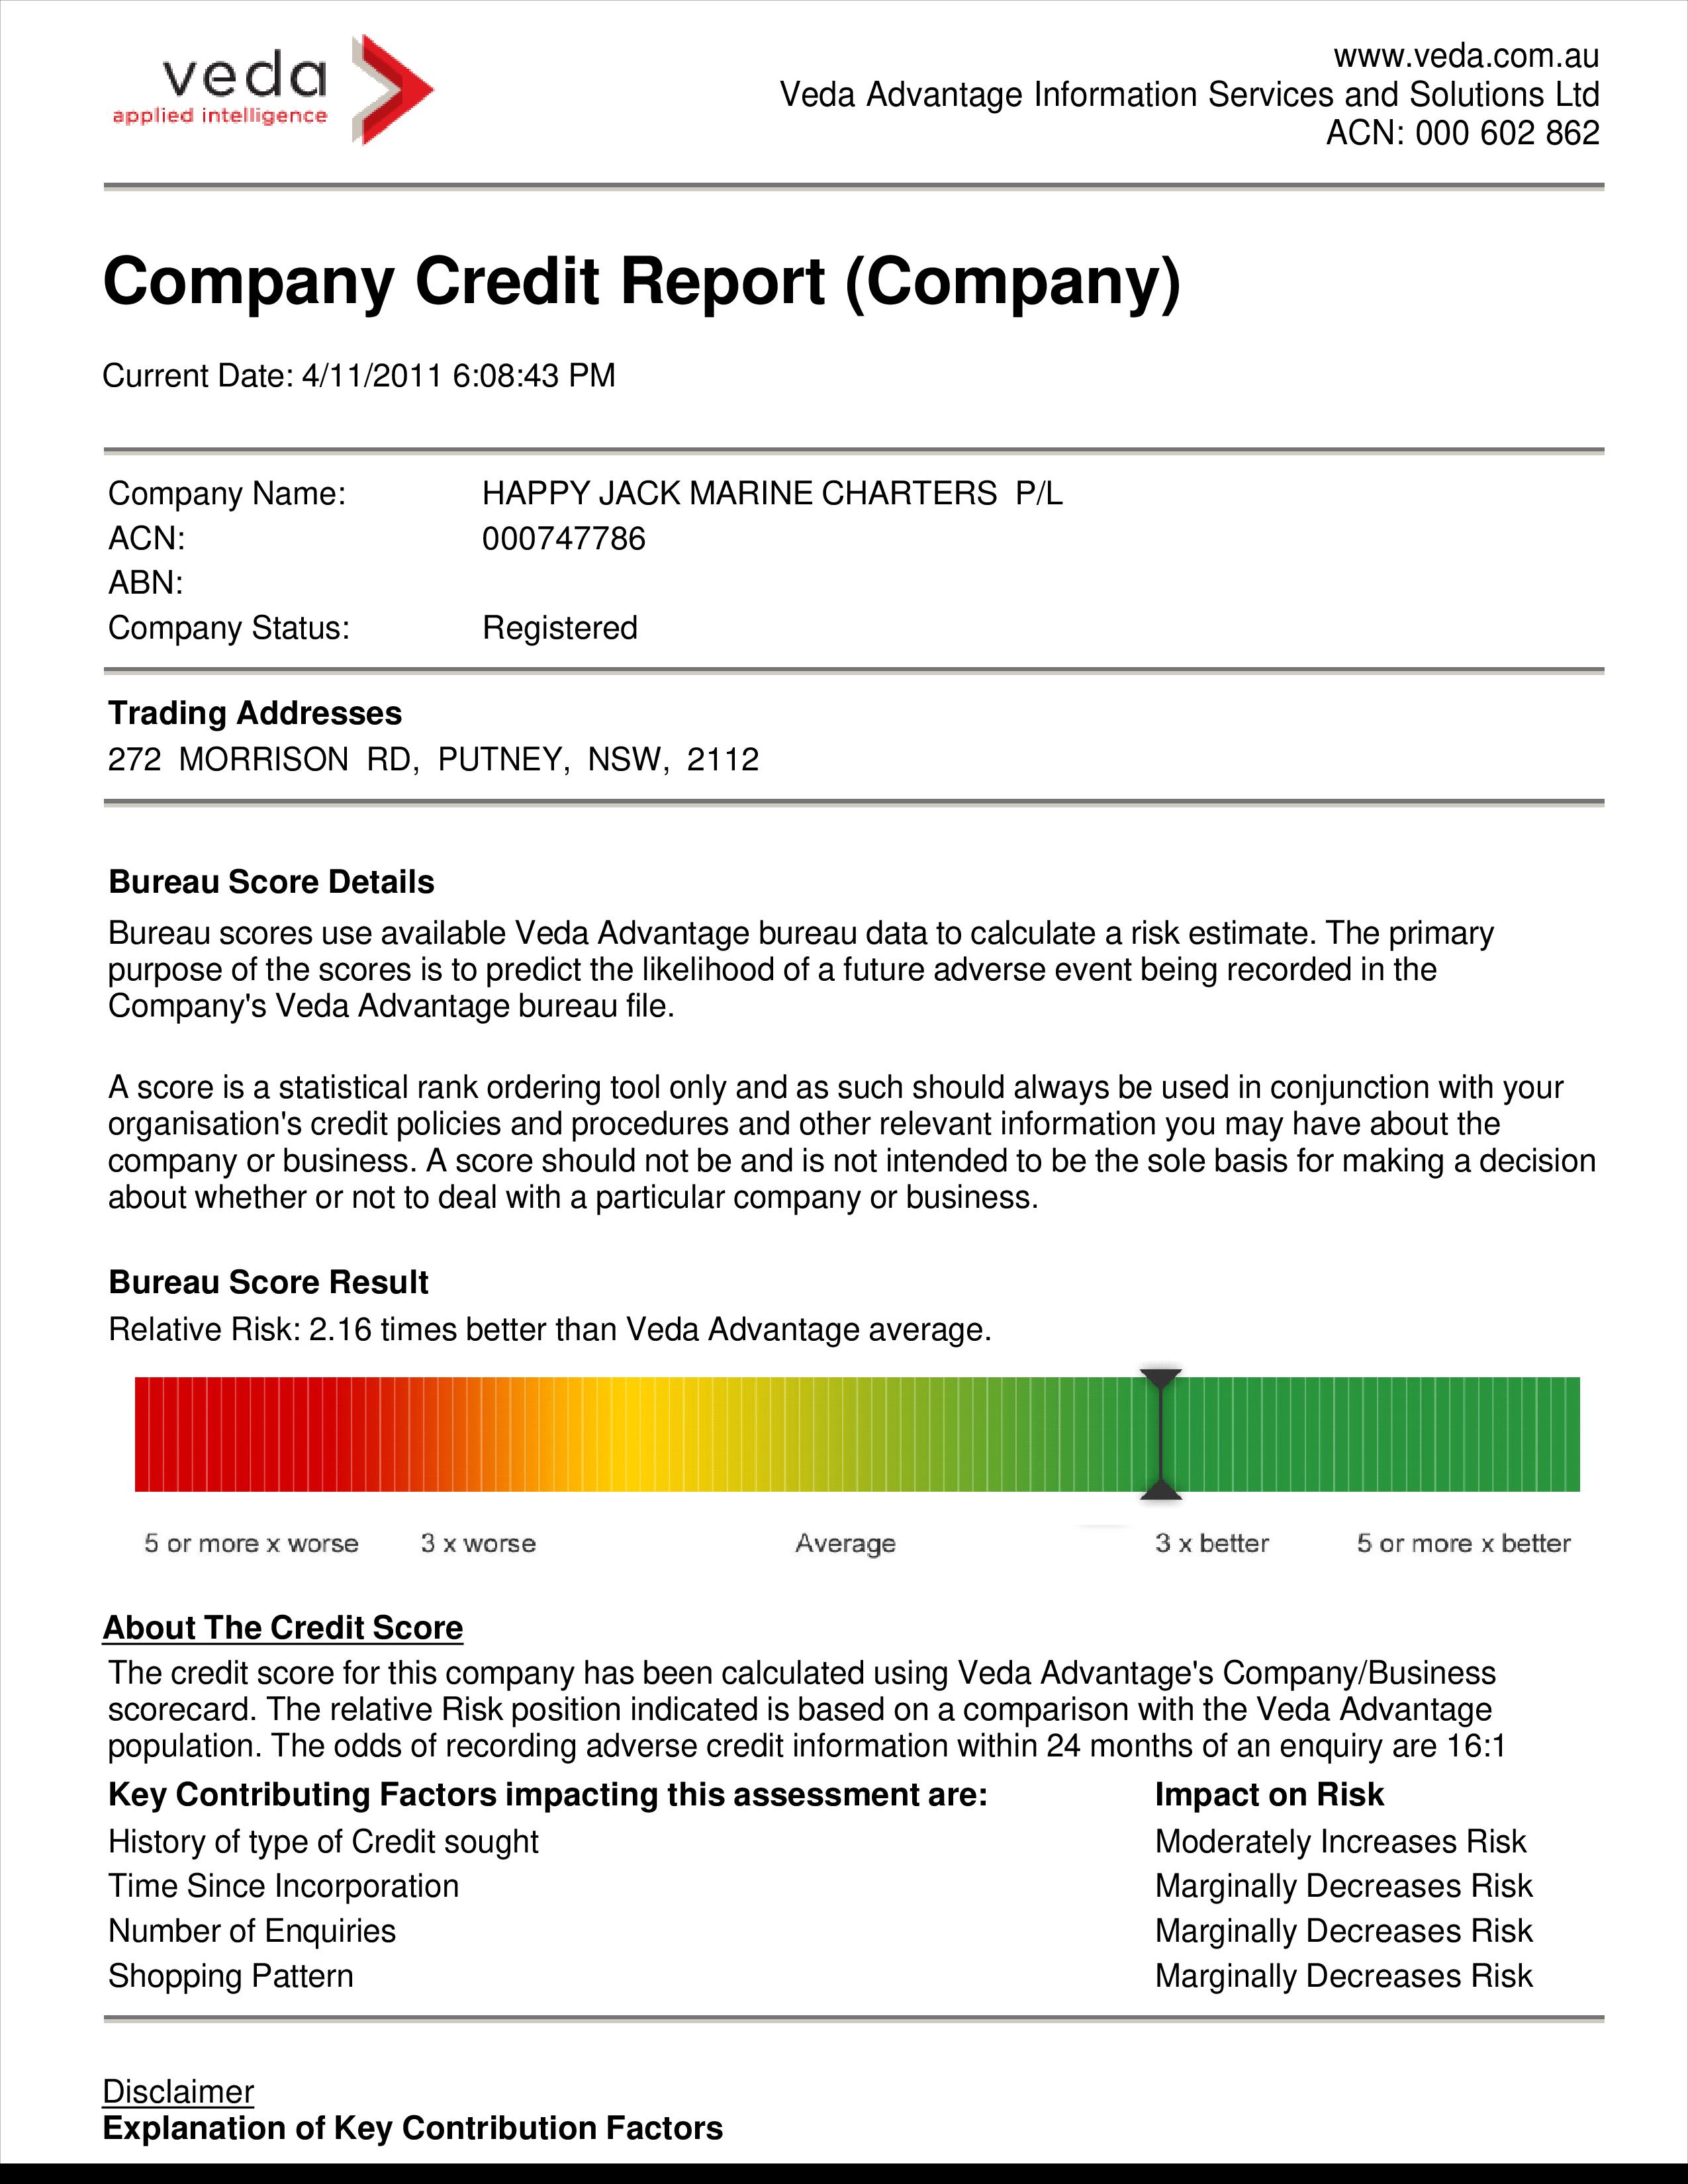 Free Company Credit Report | Templates at allbusinesstemplates.com